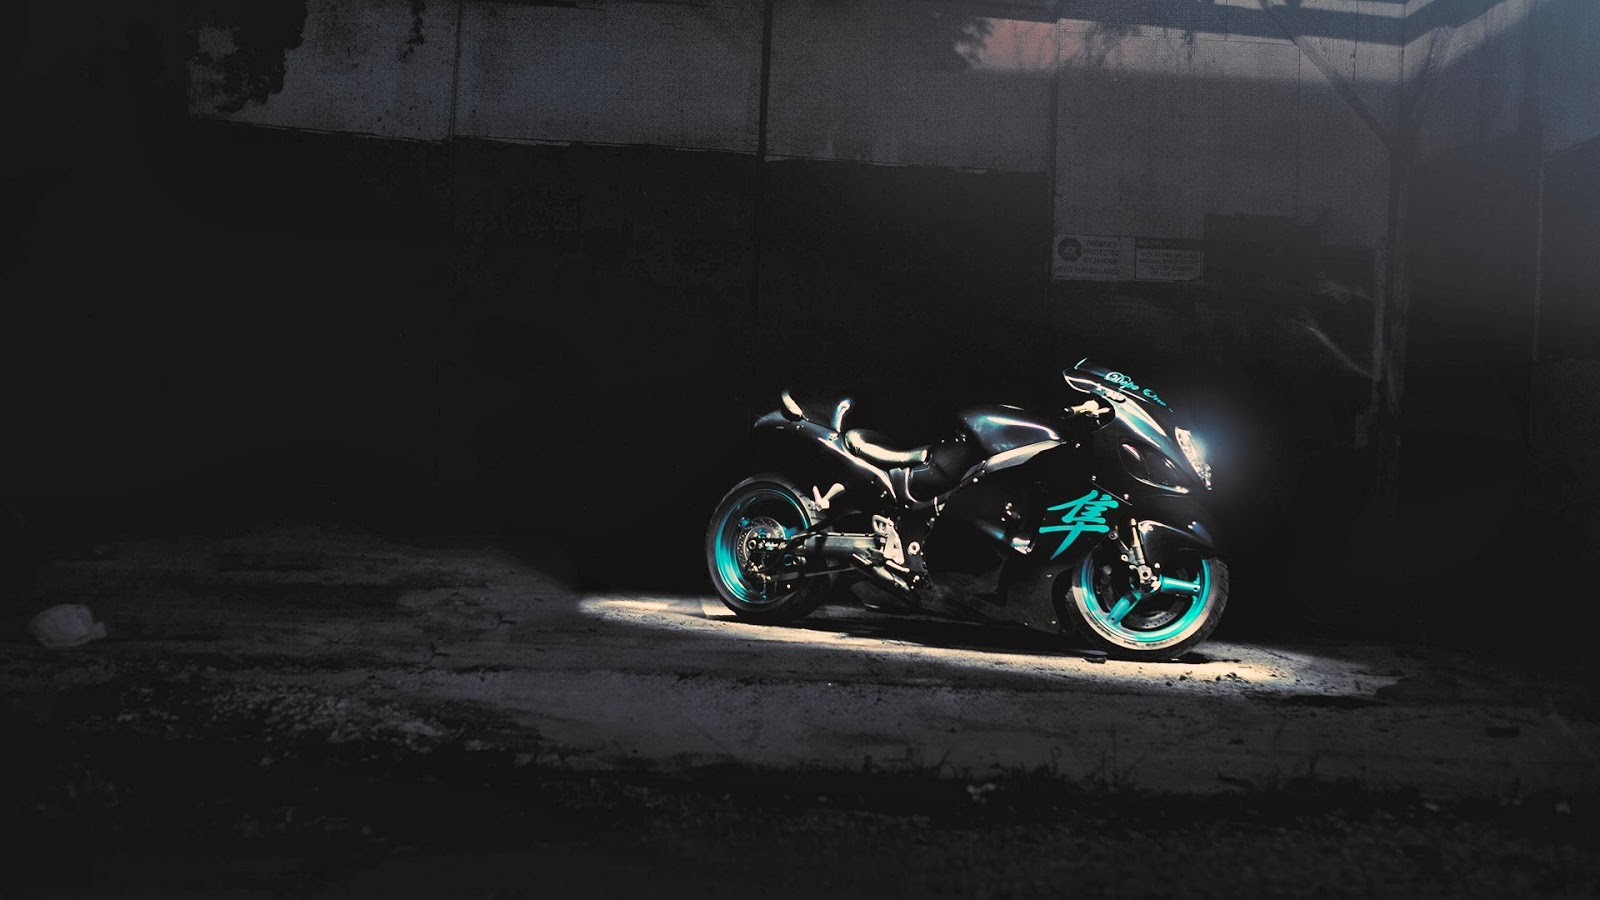 Download Free Amazing Super HD Bike Wallpapers | Free ... Hayabusa Bike  2013 Wallpaper Suzuki ...